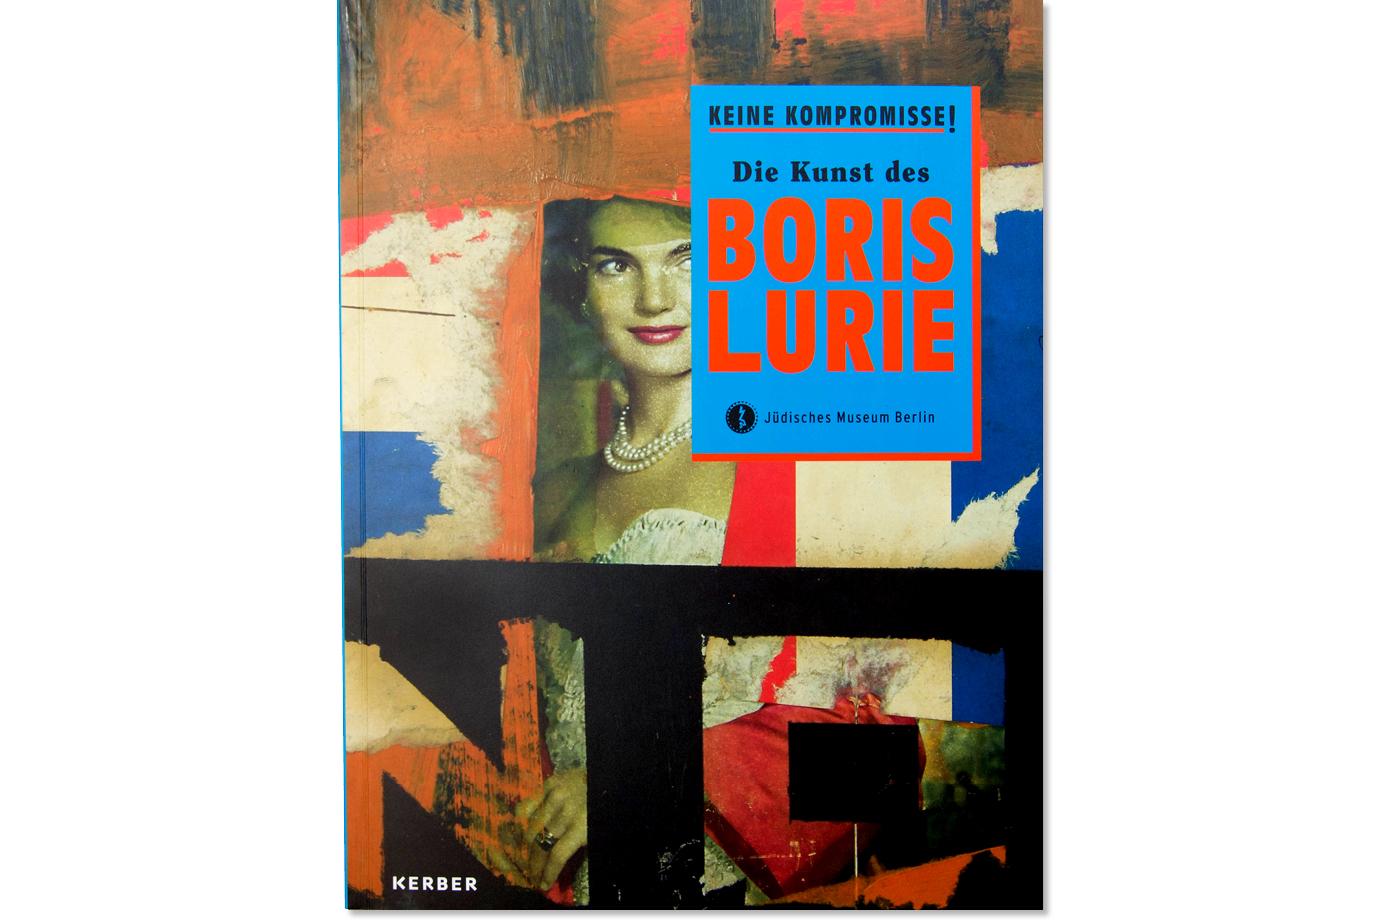 http://e-o-t.de/wordpress/wp-content/uploads/2017/03/Slide-Book_Lurie_1-1.jpg